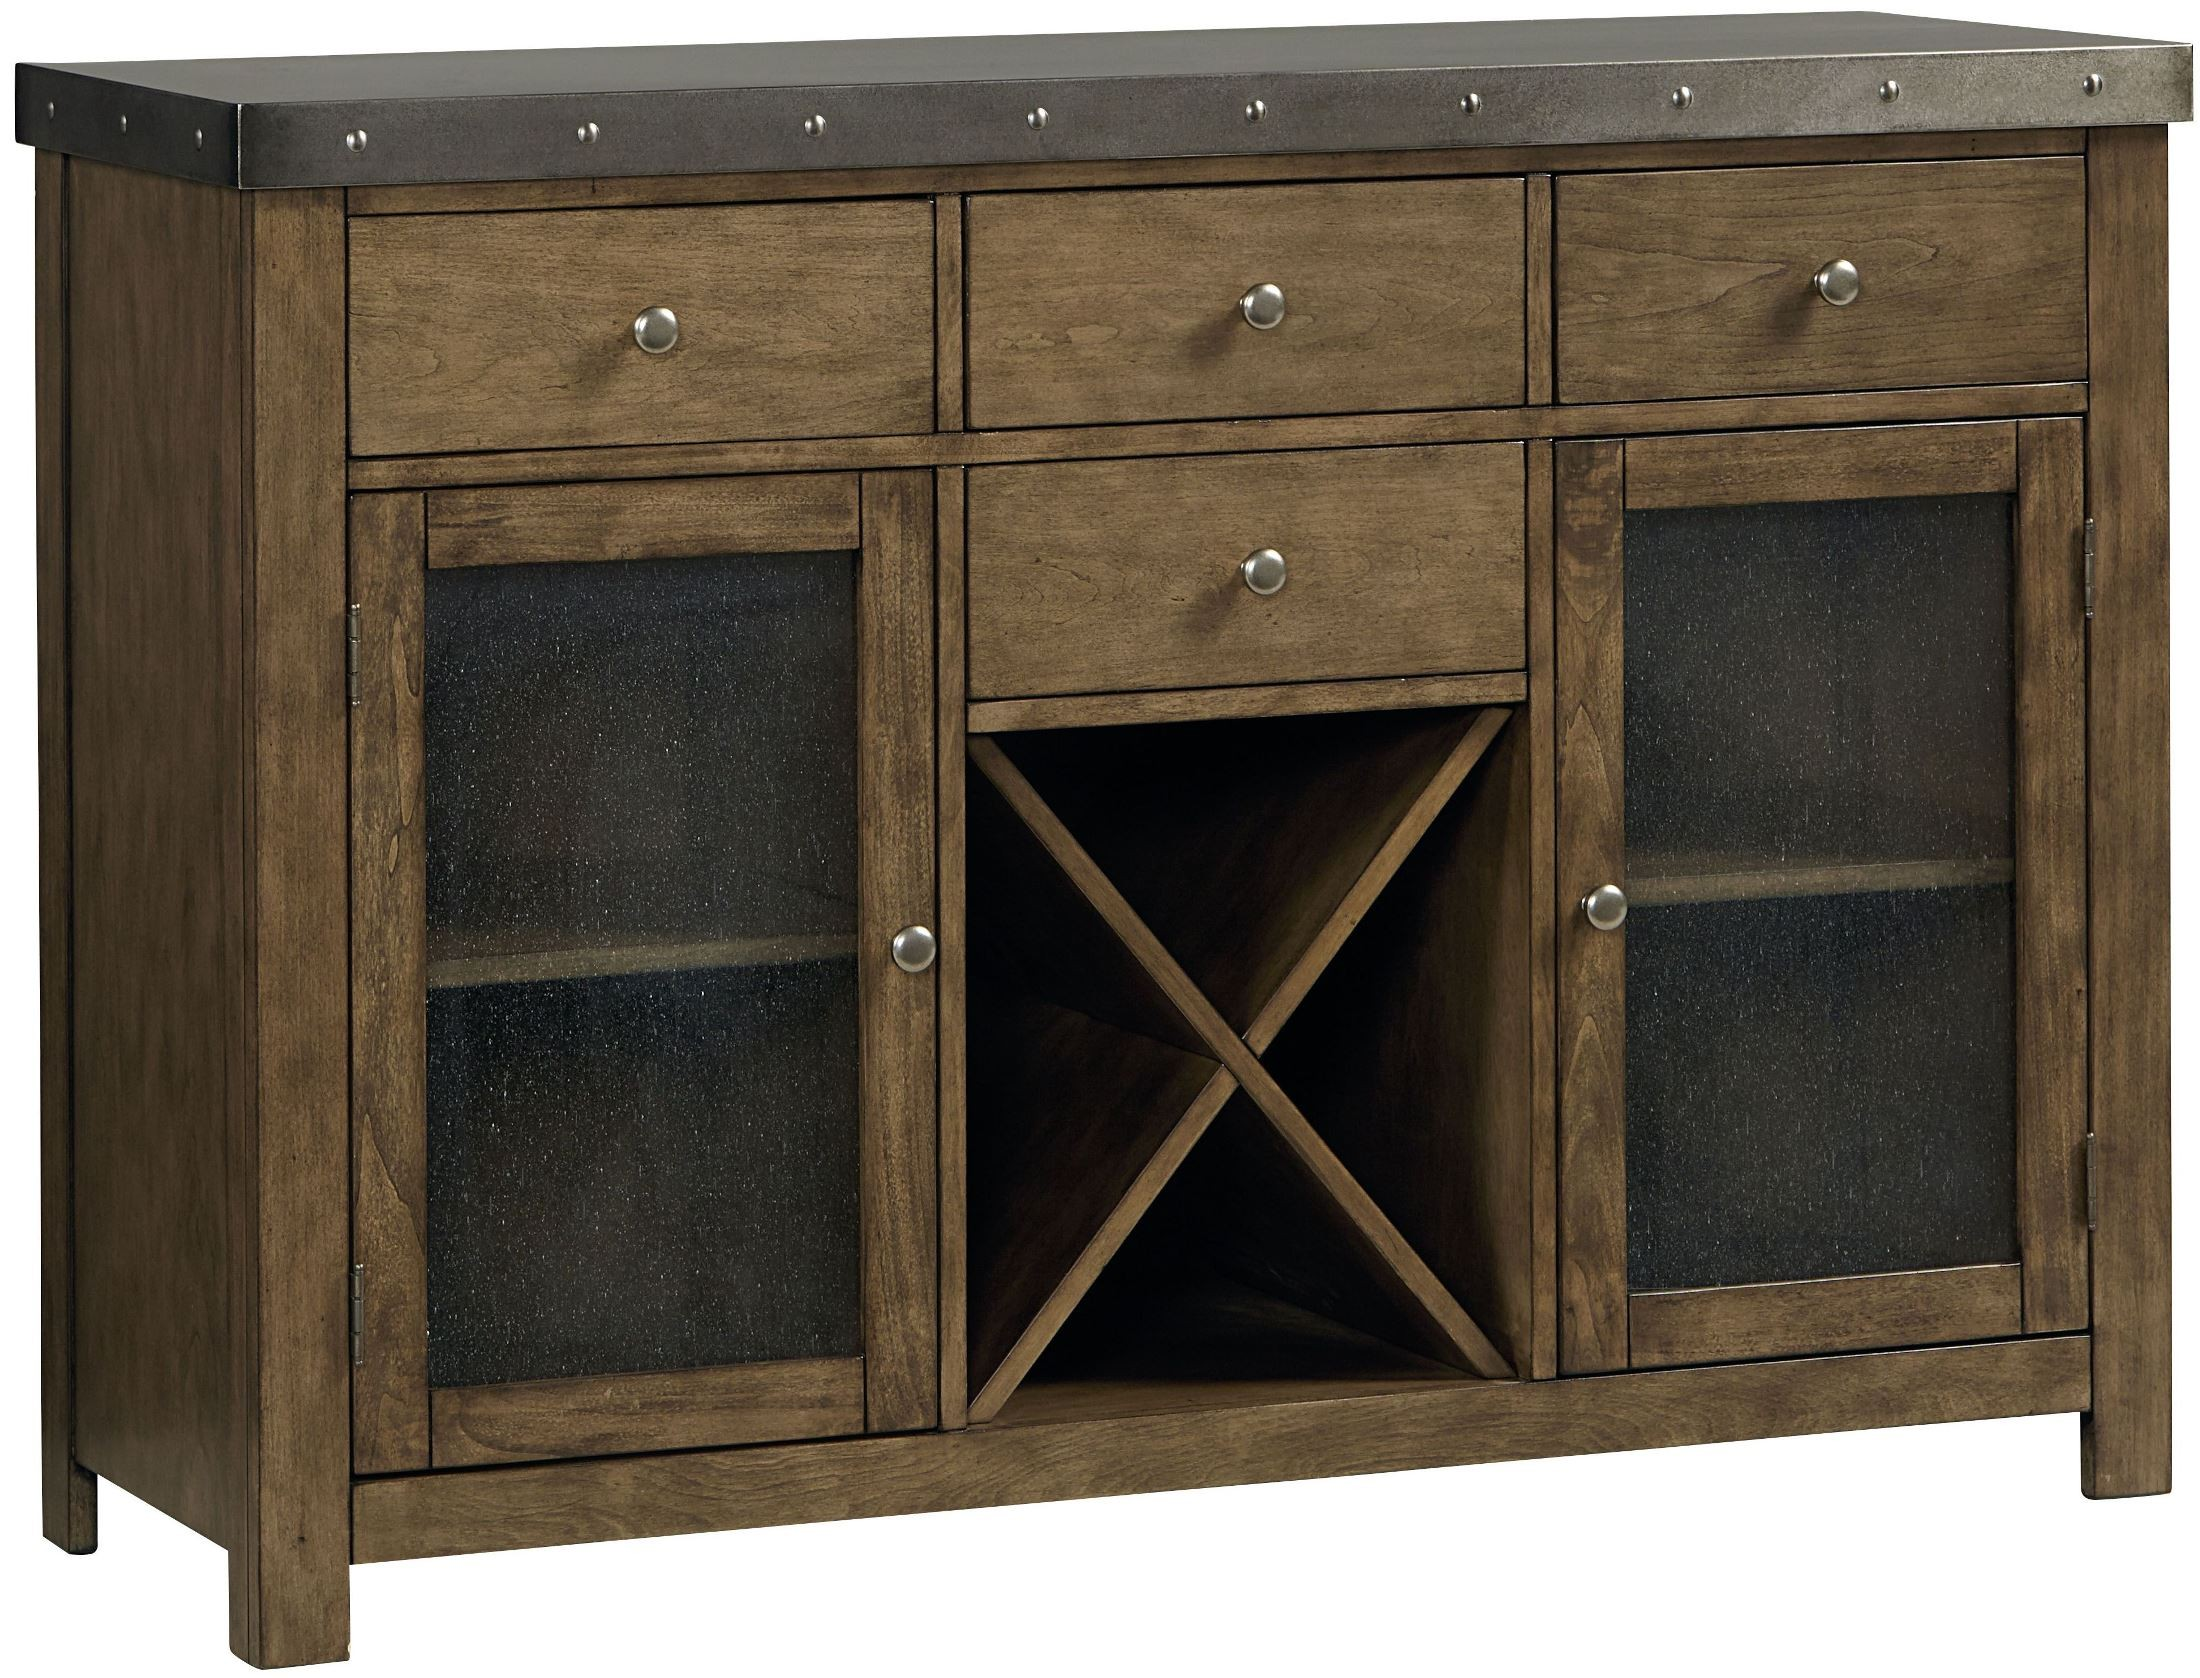 Riverton Seeded Glass Doors Server 13462 Standard Furniture